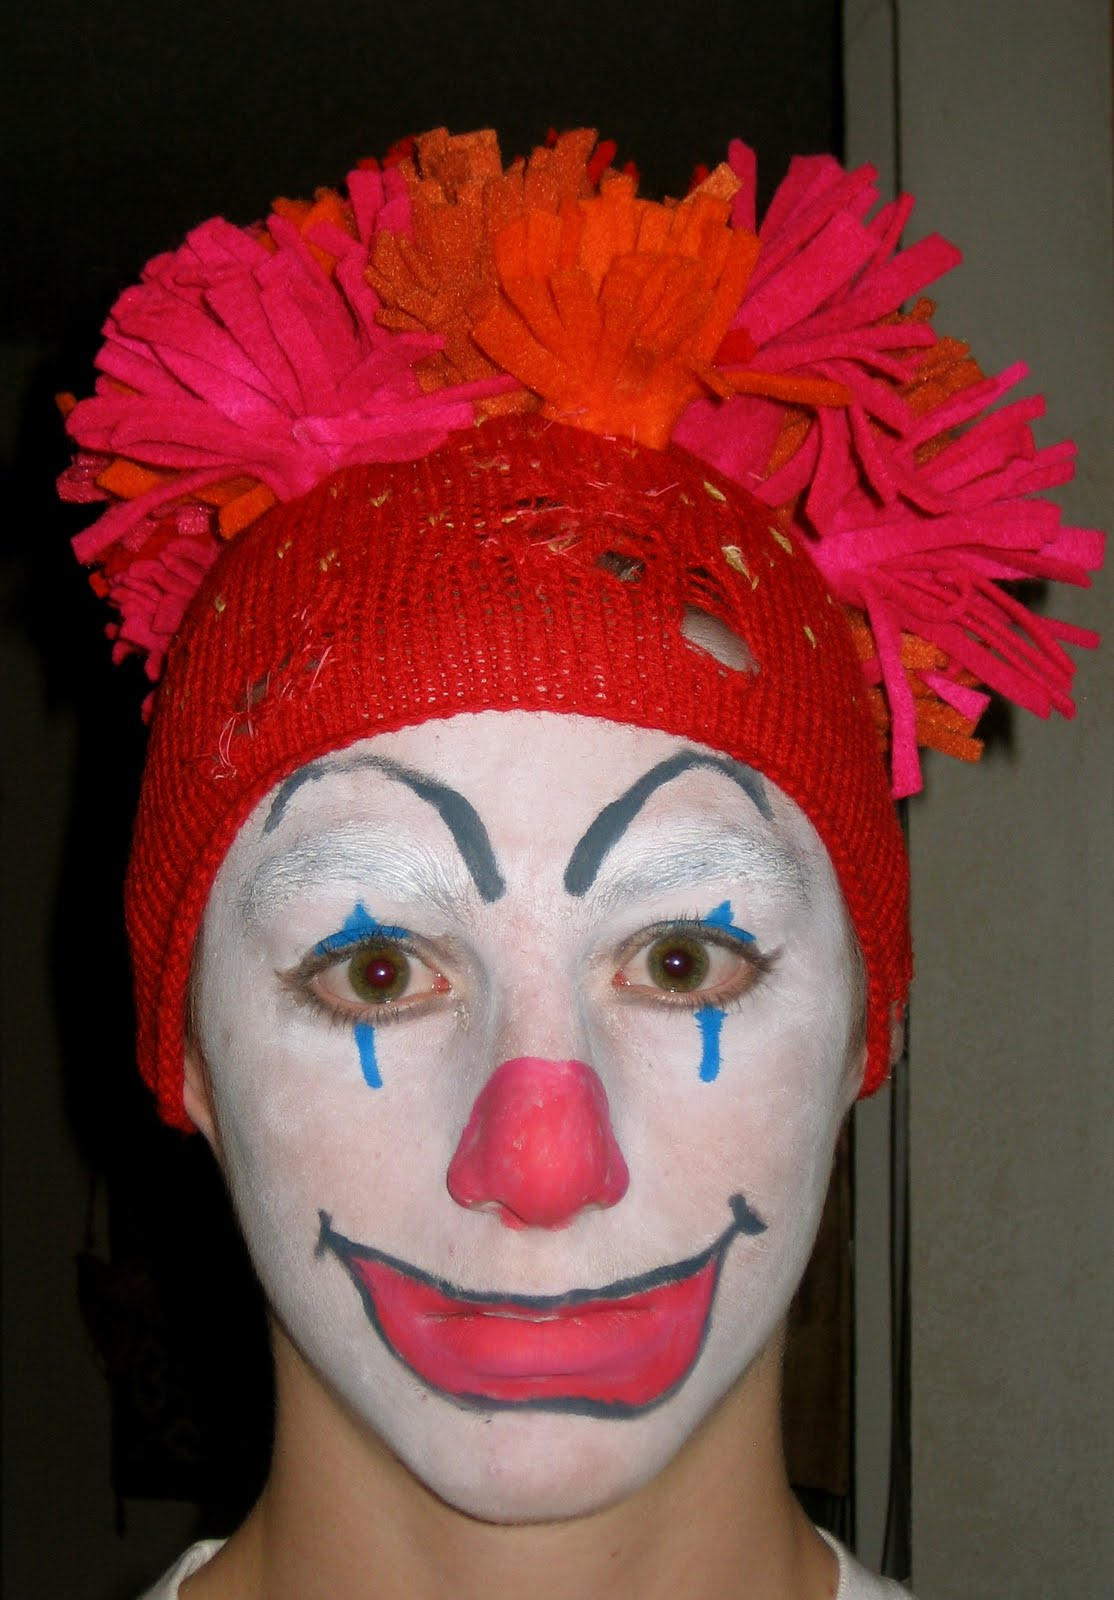 Happy Clown Faces - Bing images